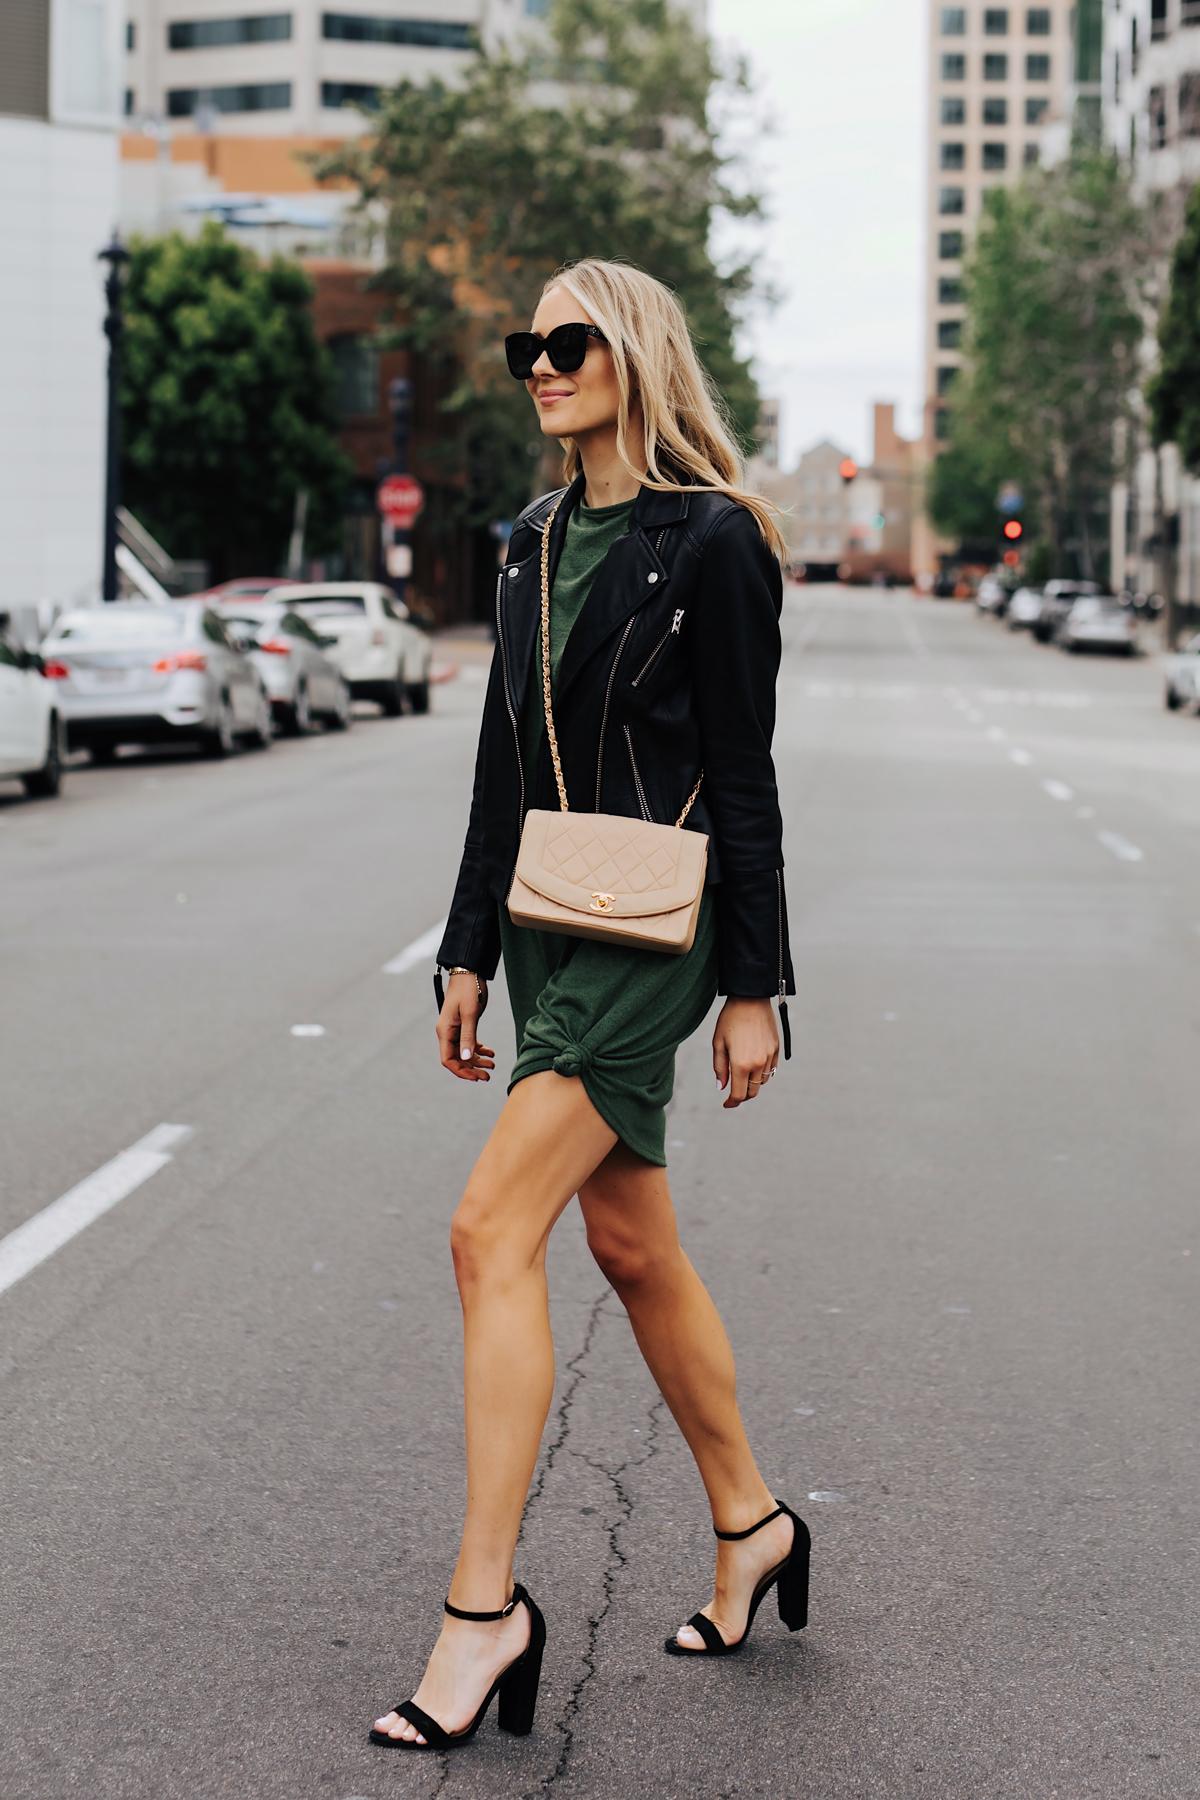 Blonde Woman Wearing Green Tshirt Dress Black Leather Jacket Black Heeled Sandals Chanel Beige Crossbody Fashion Jackson San Diego Fashion Blogger Street Style